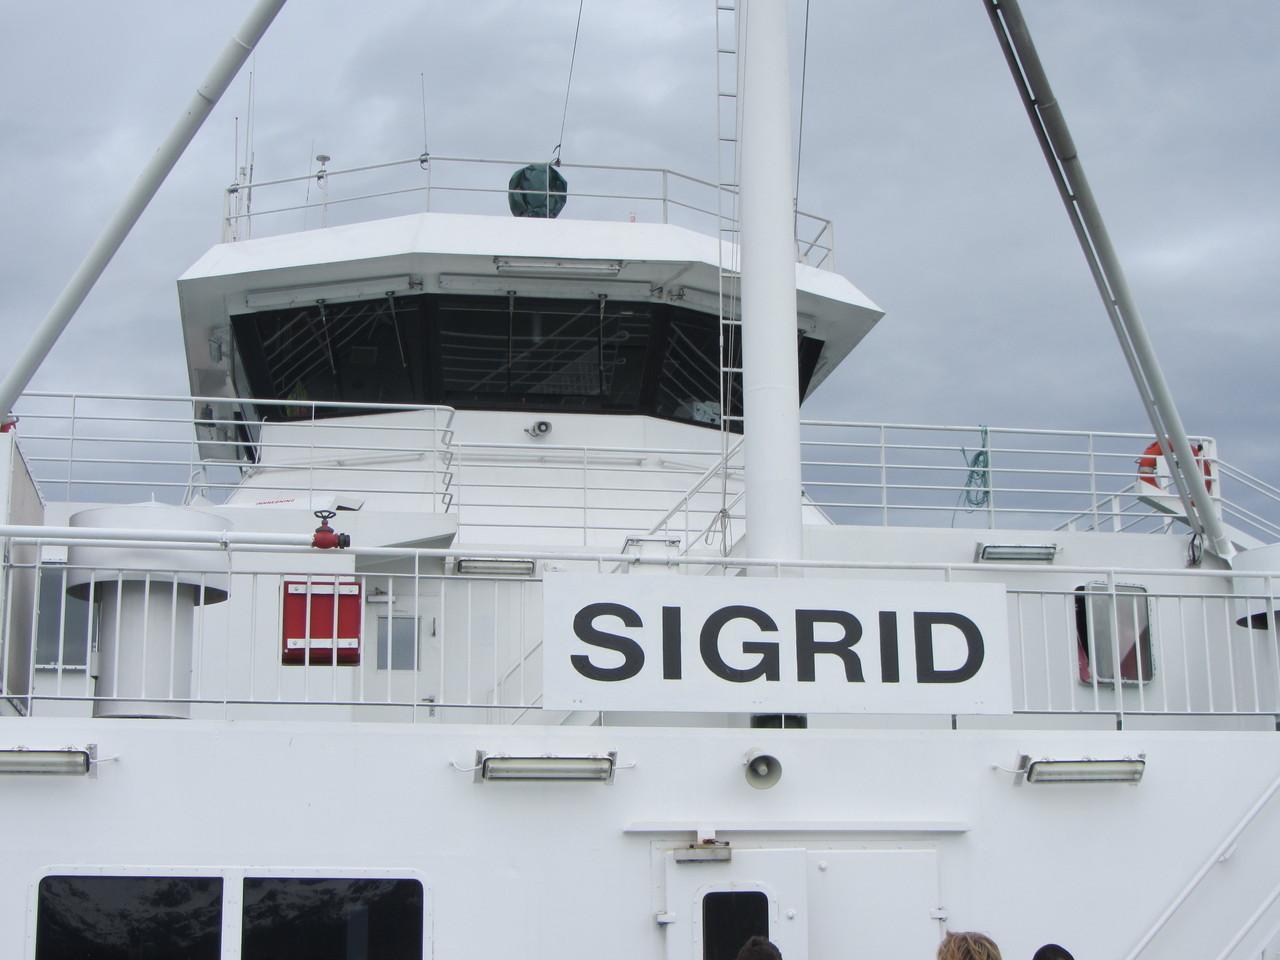 dann bringt uns Sigrid über